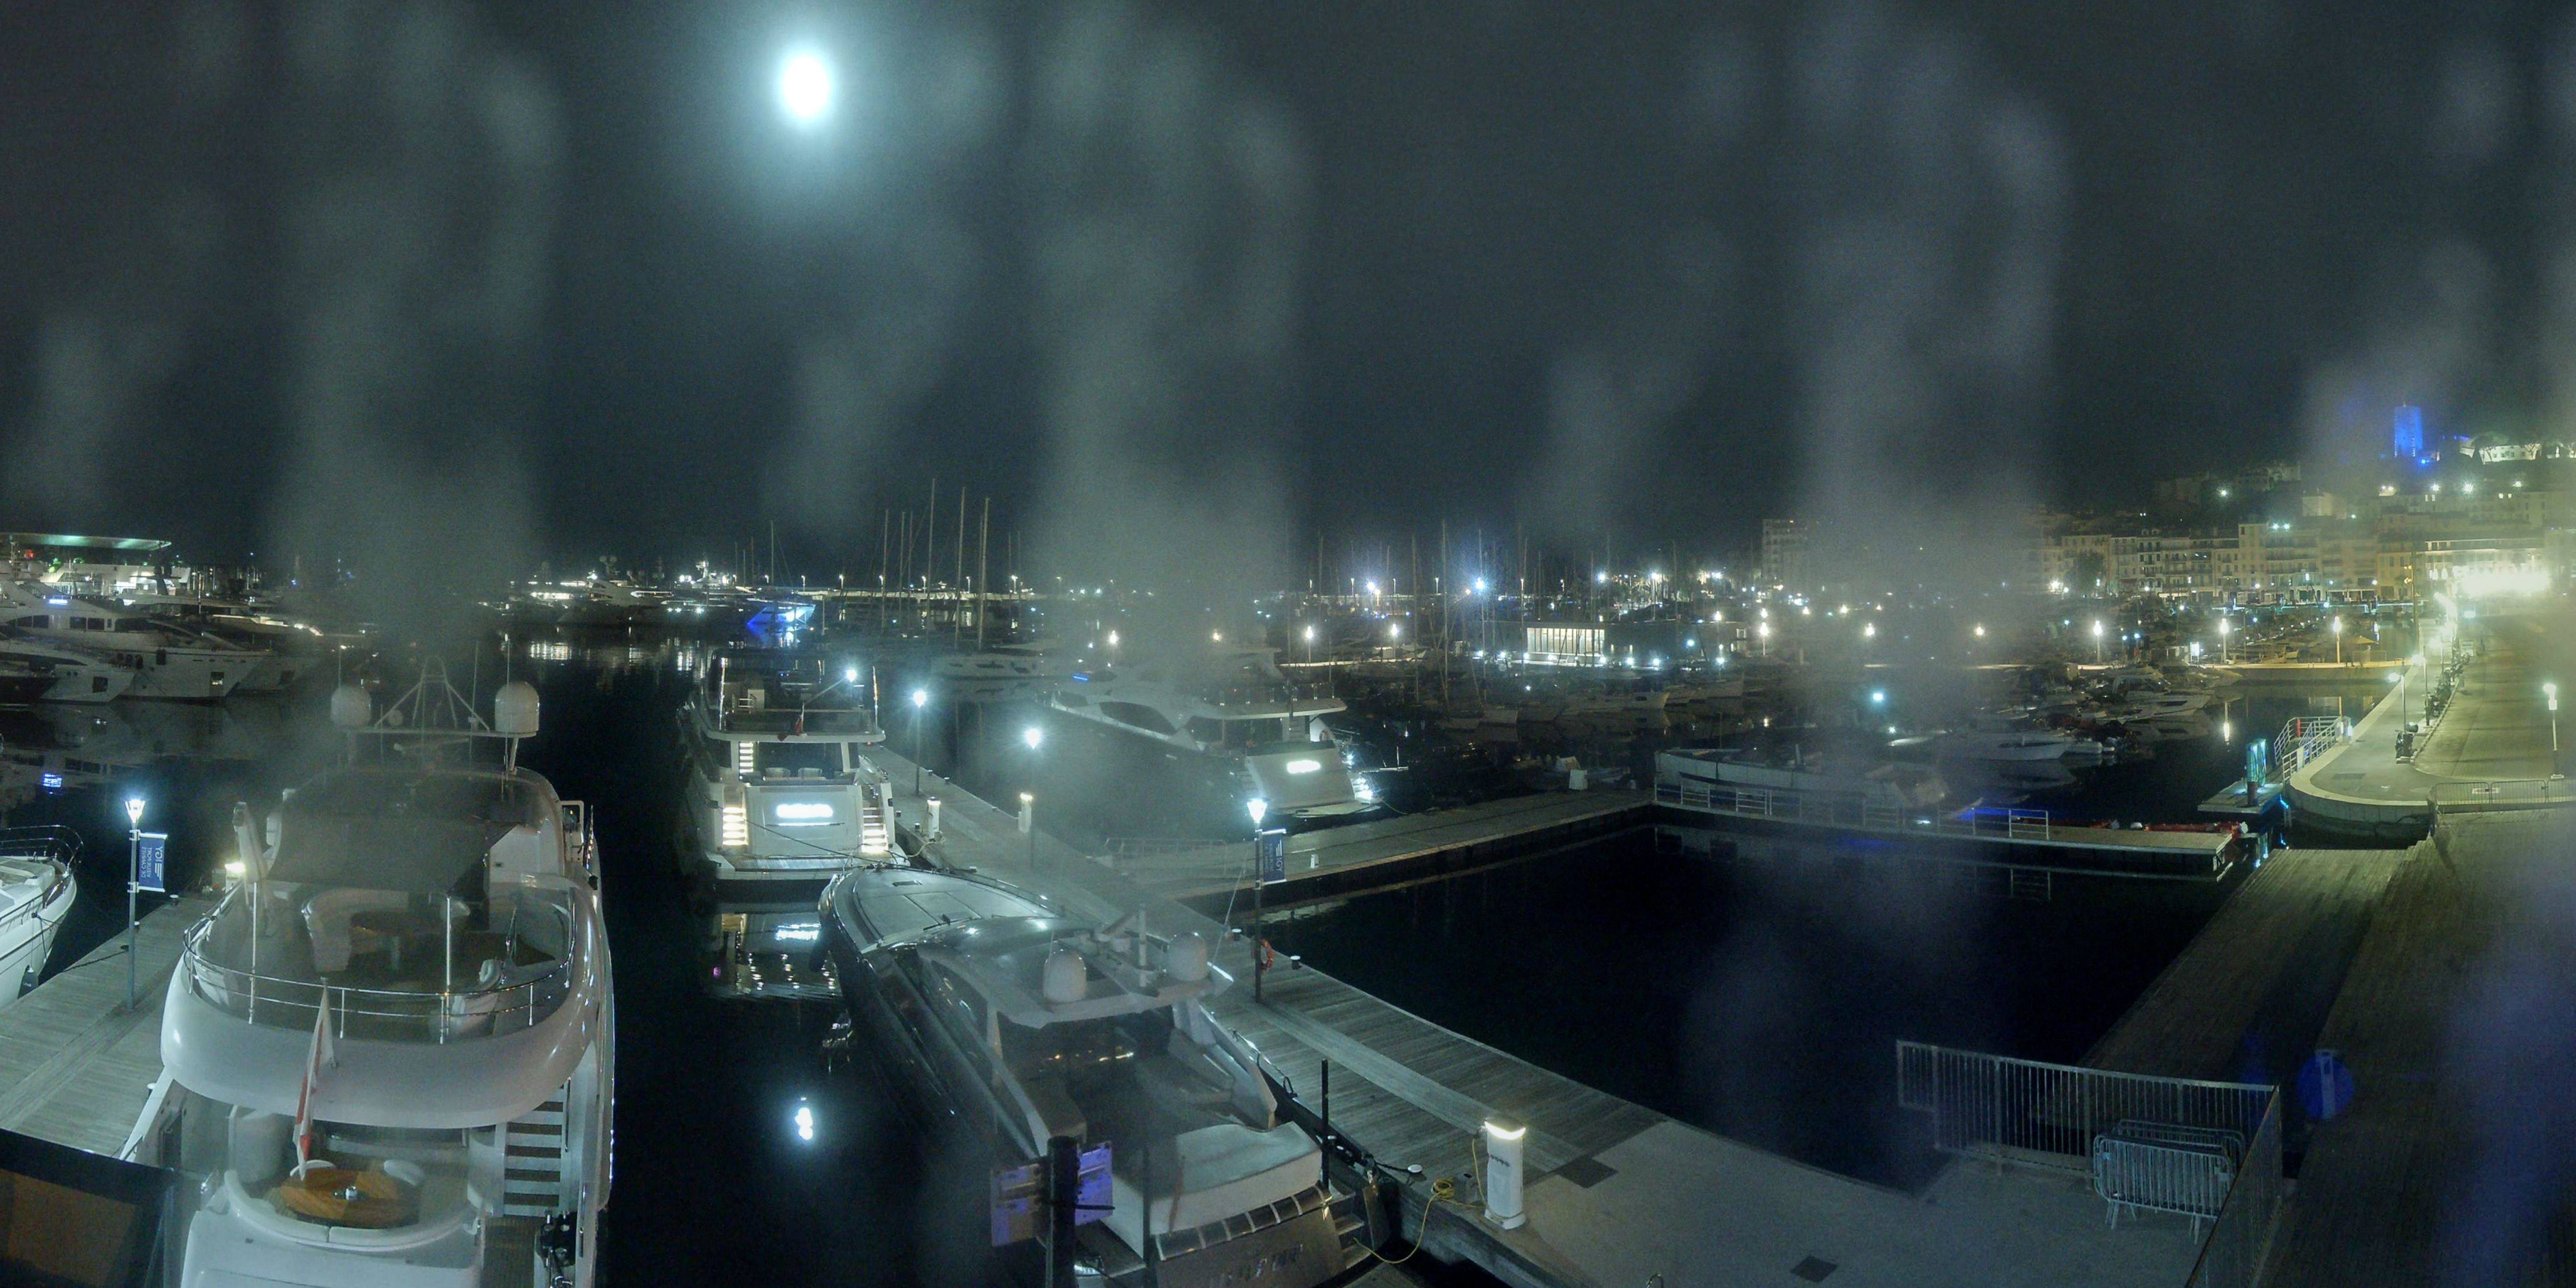 Cannes Thu. 04:35